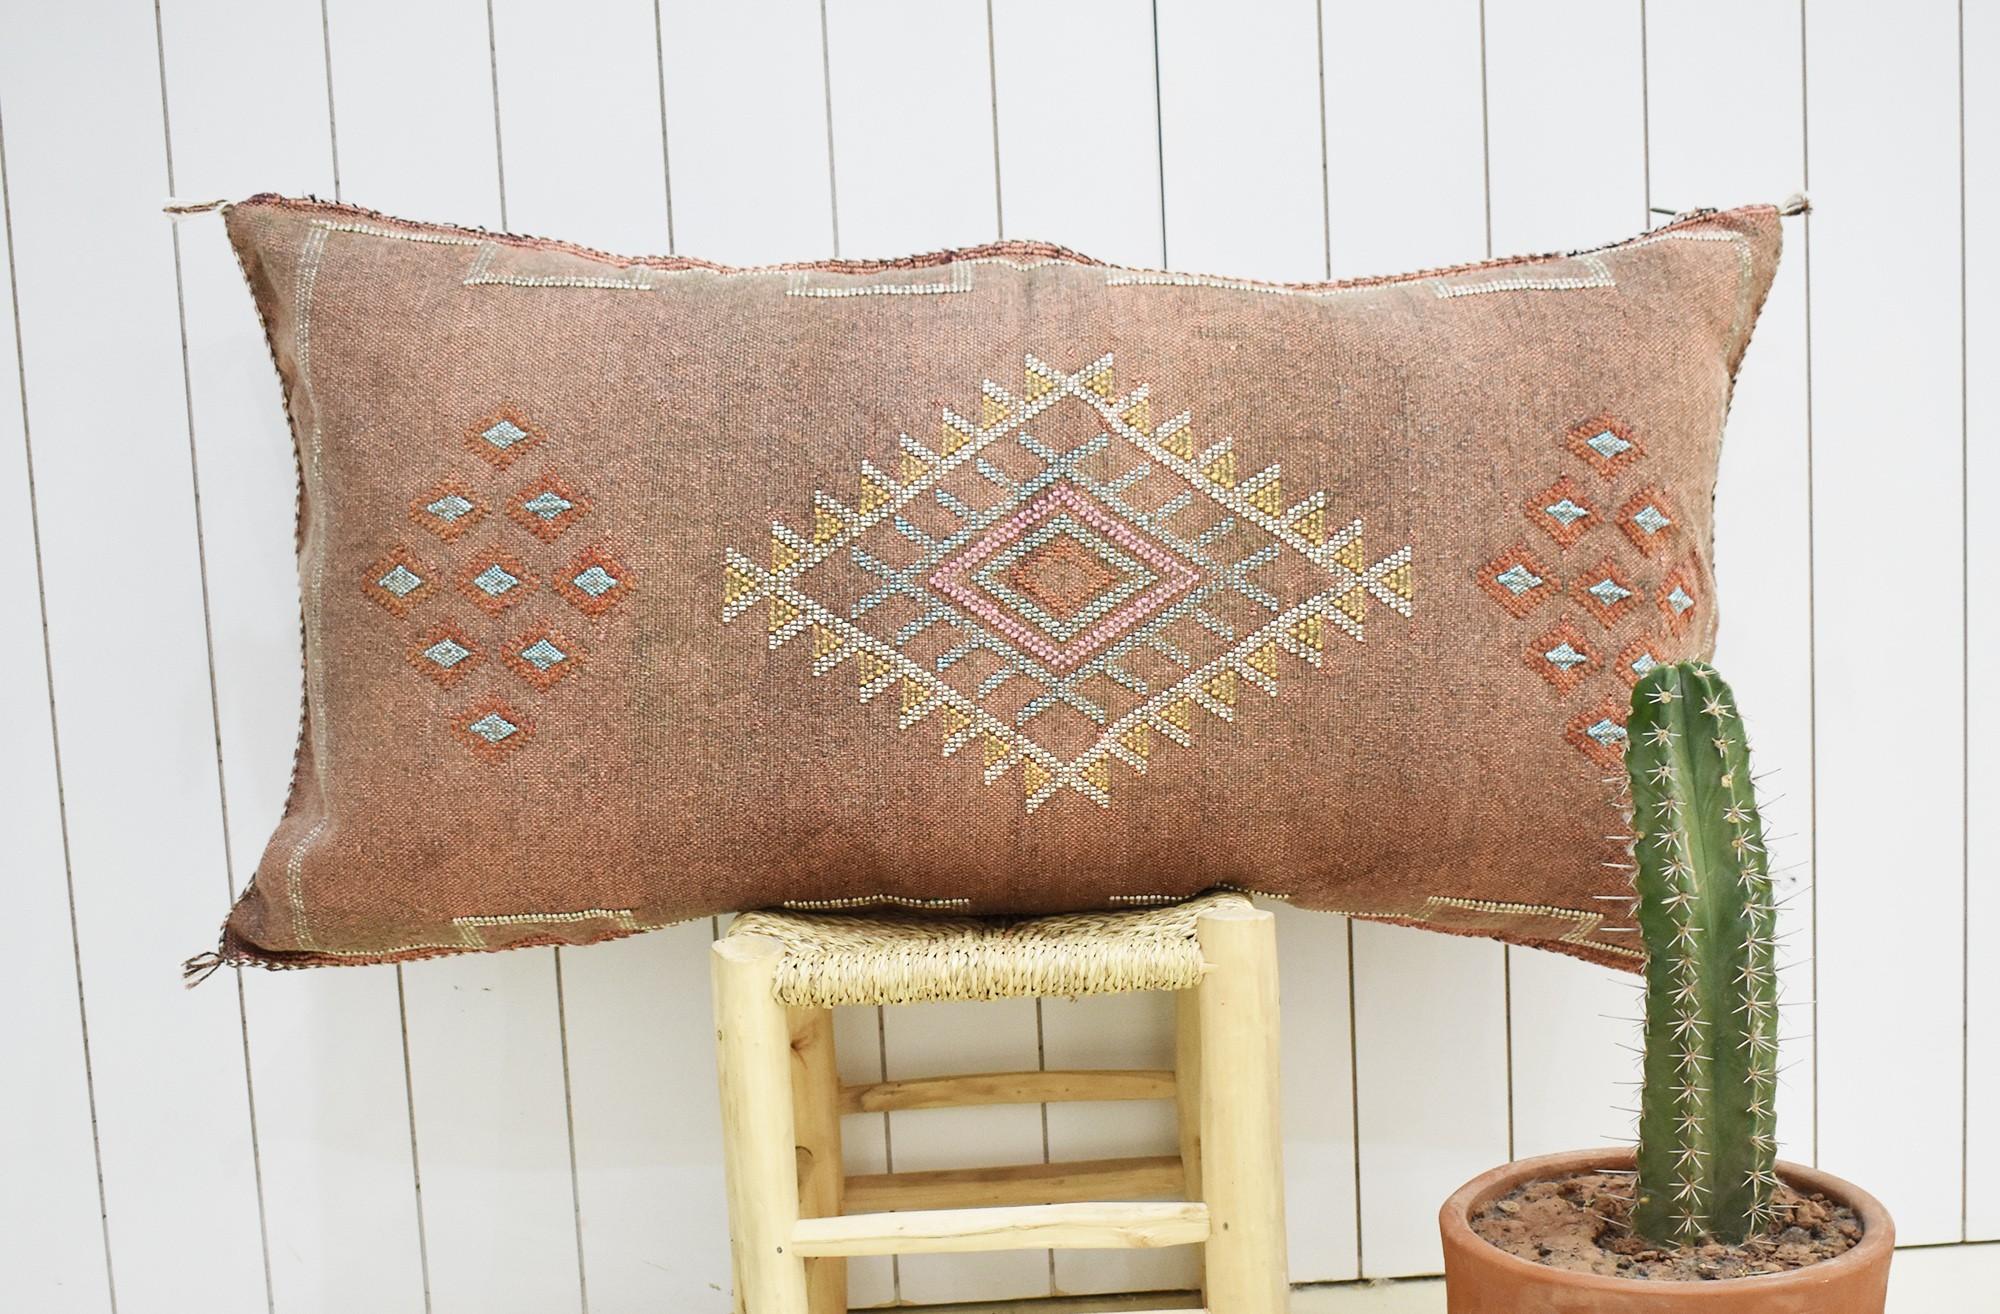 Traversin sabra terre délavé petits motifs